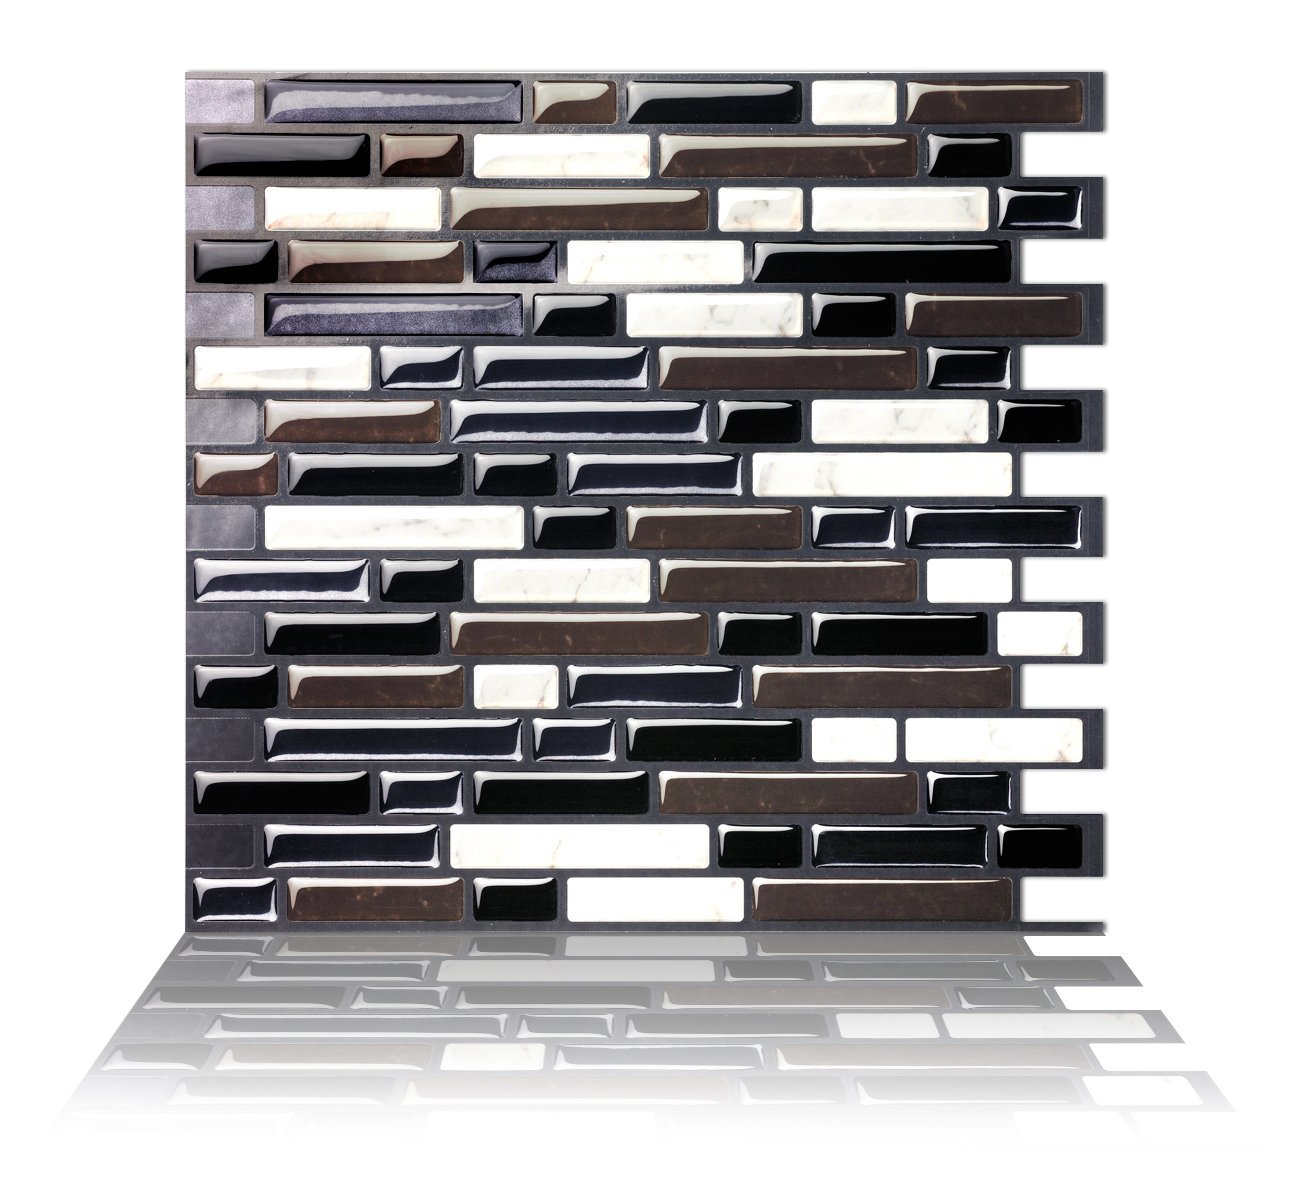 Tic Tac Tiles - Premium Anti Mold Peel and Stick Wall Tile Backsplash in Como Black